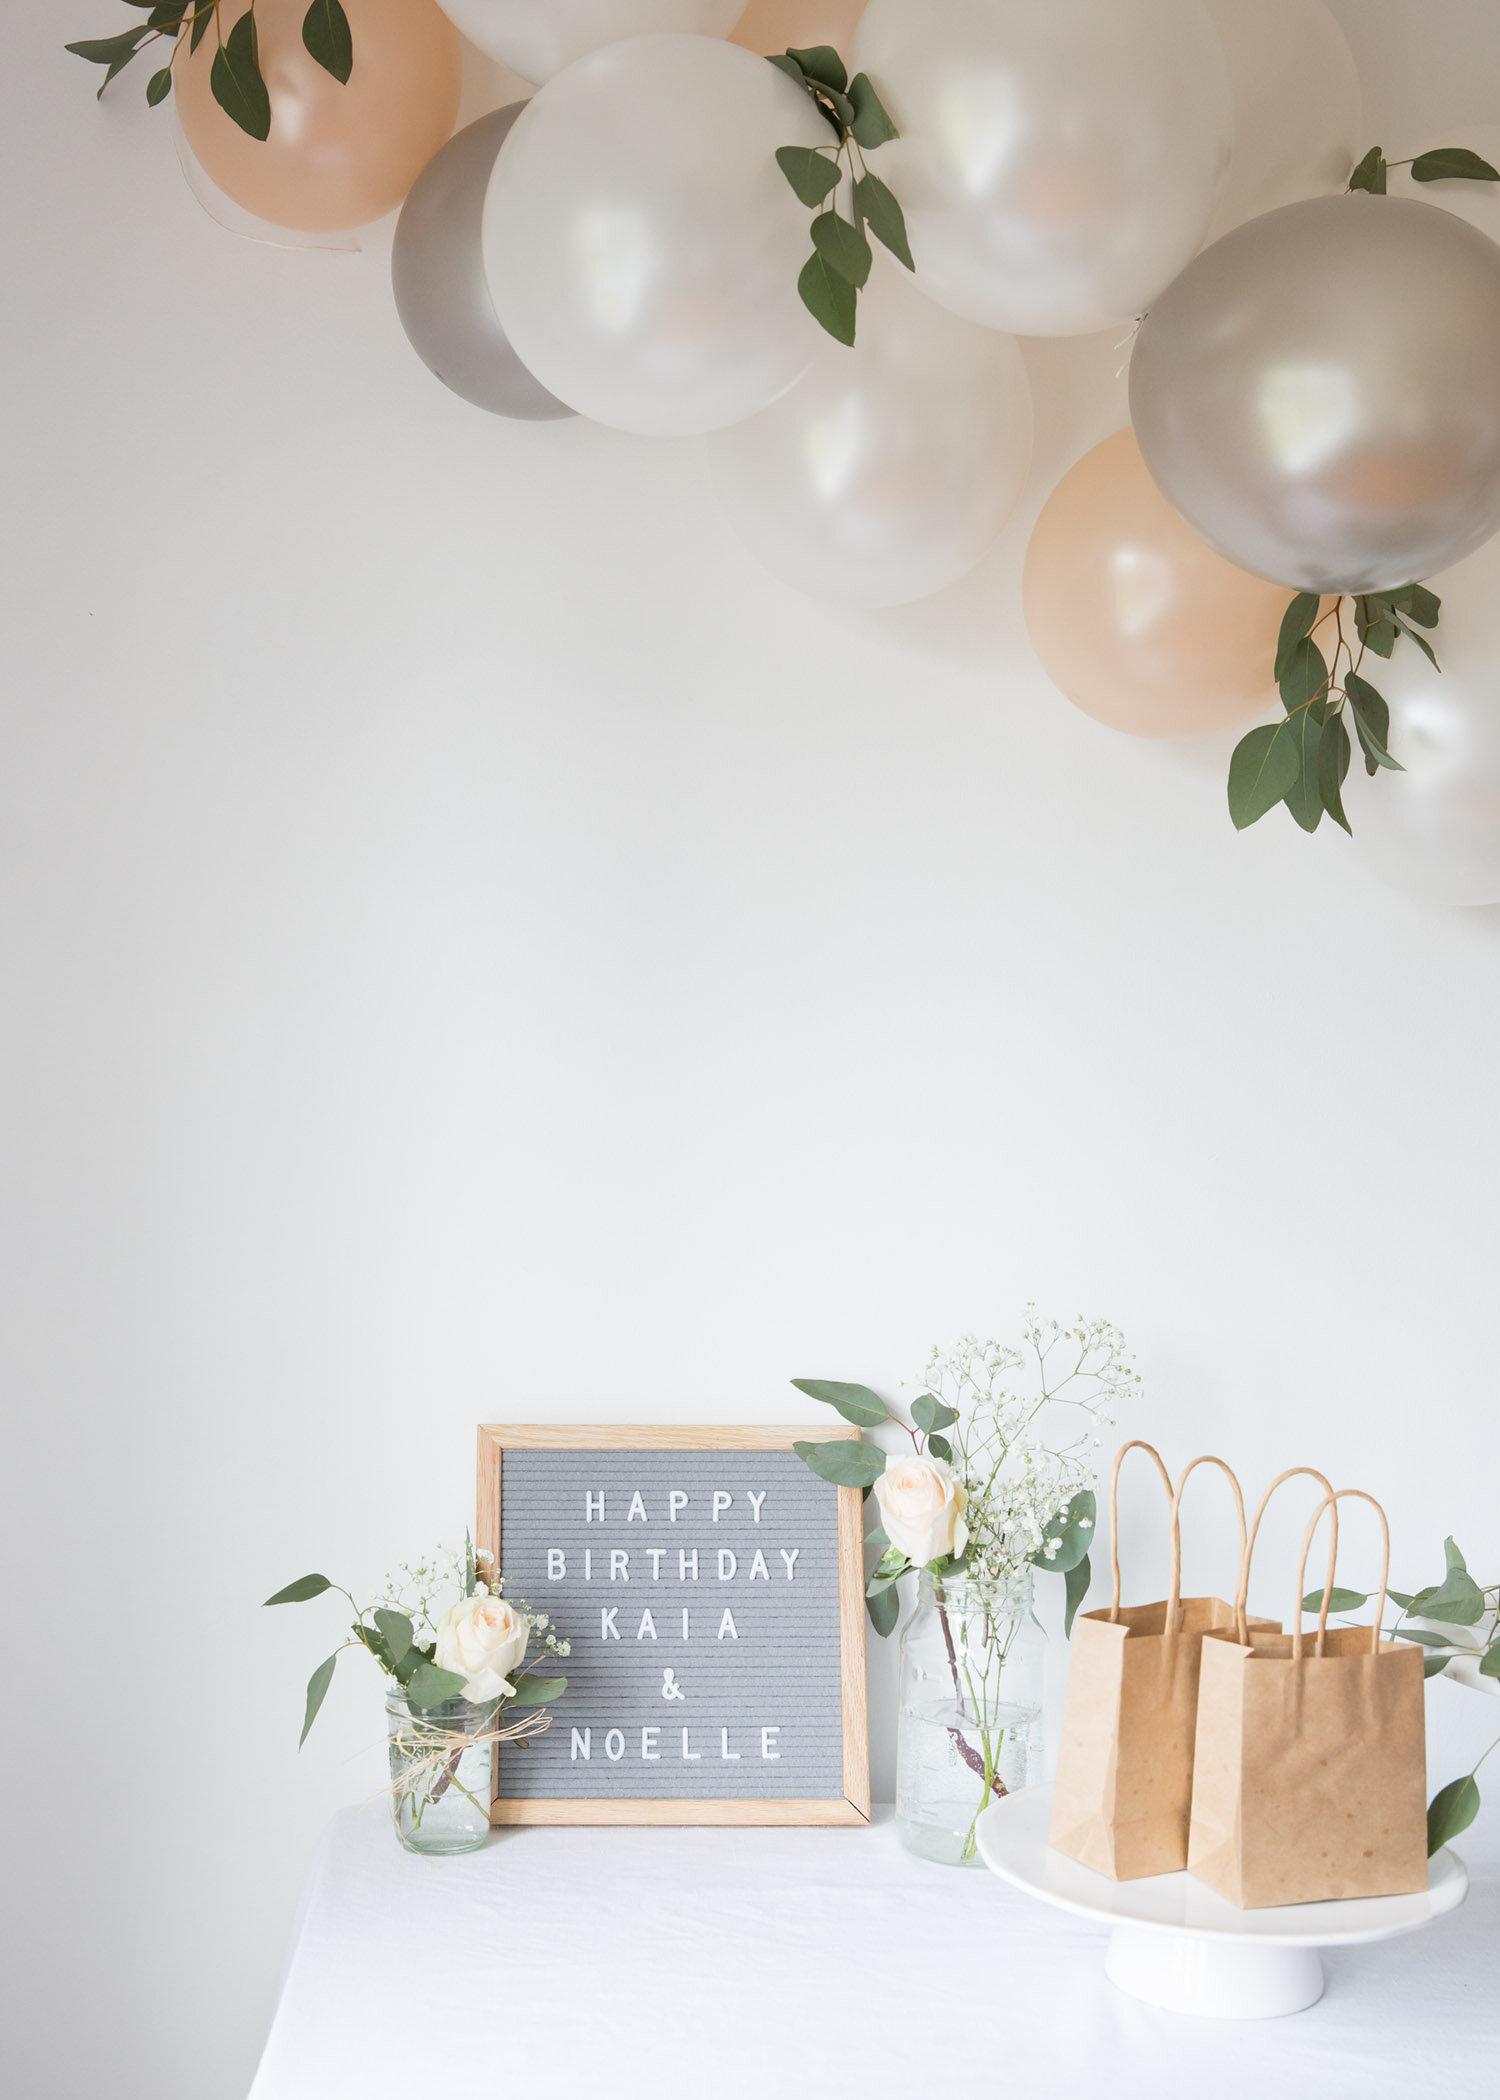 felt letter board on birthday table